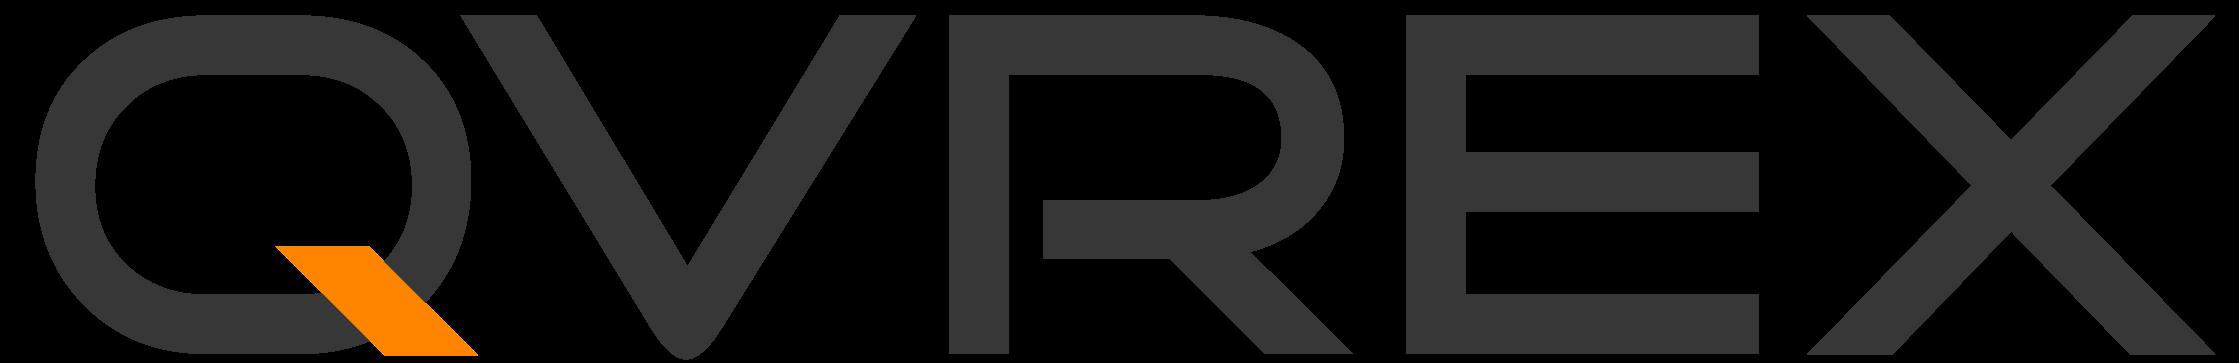 logo_qvrex.png